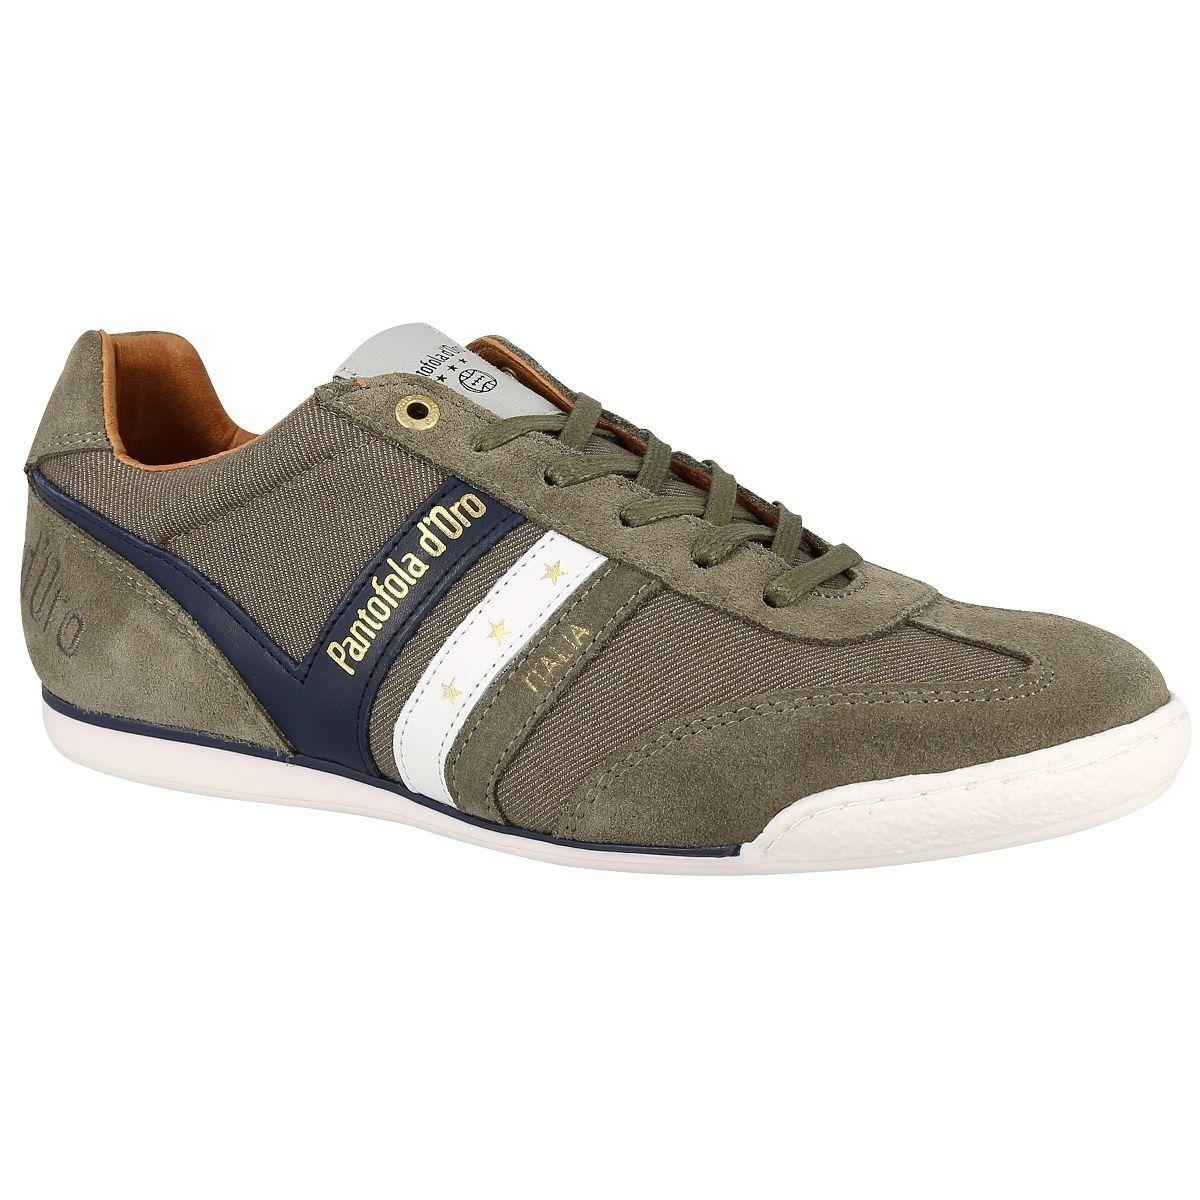 Sneaker CuirTextile | Products | Baskets adidas, Baskets et